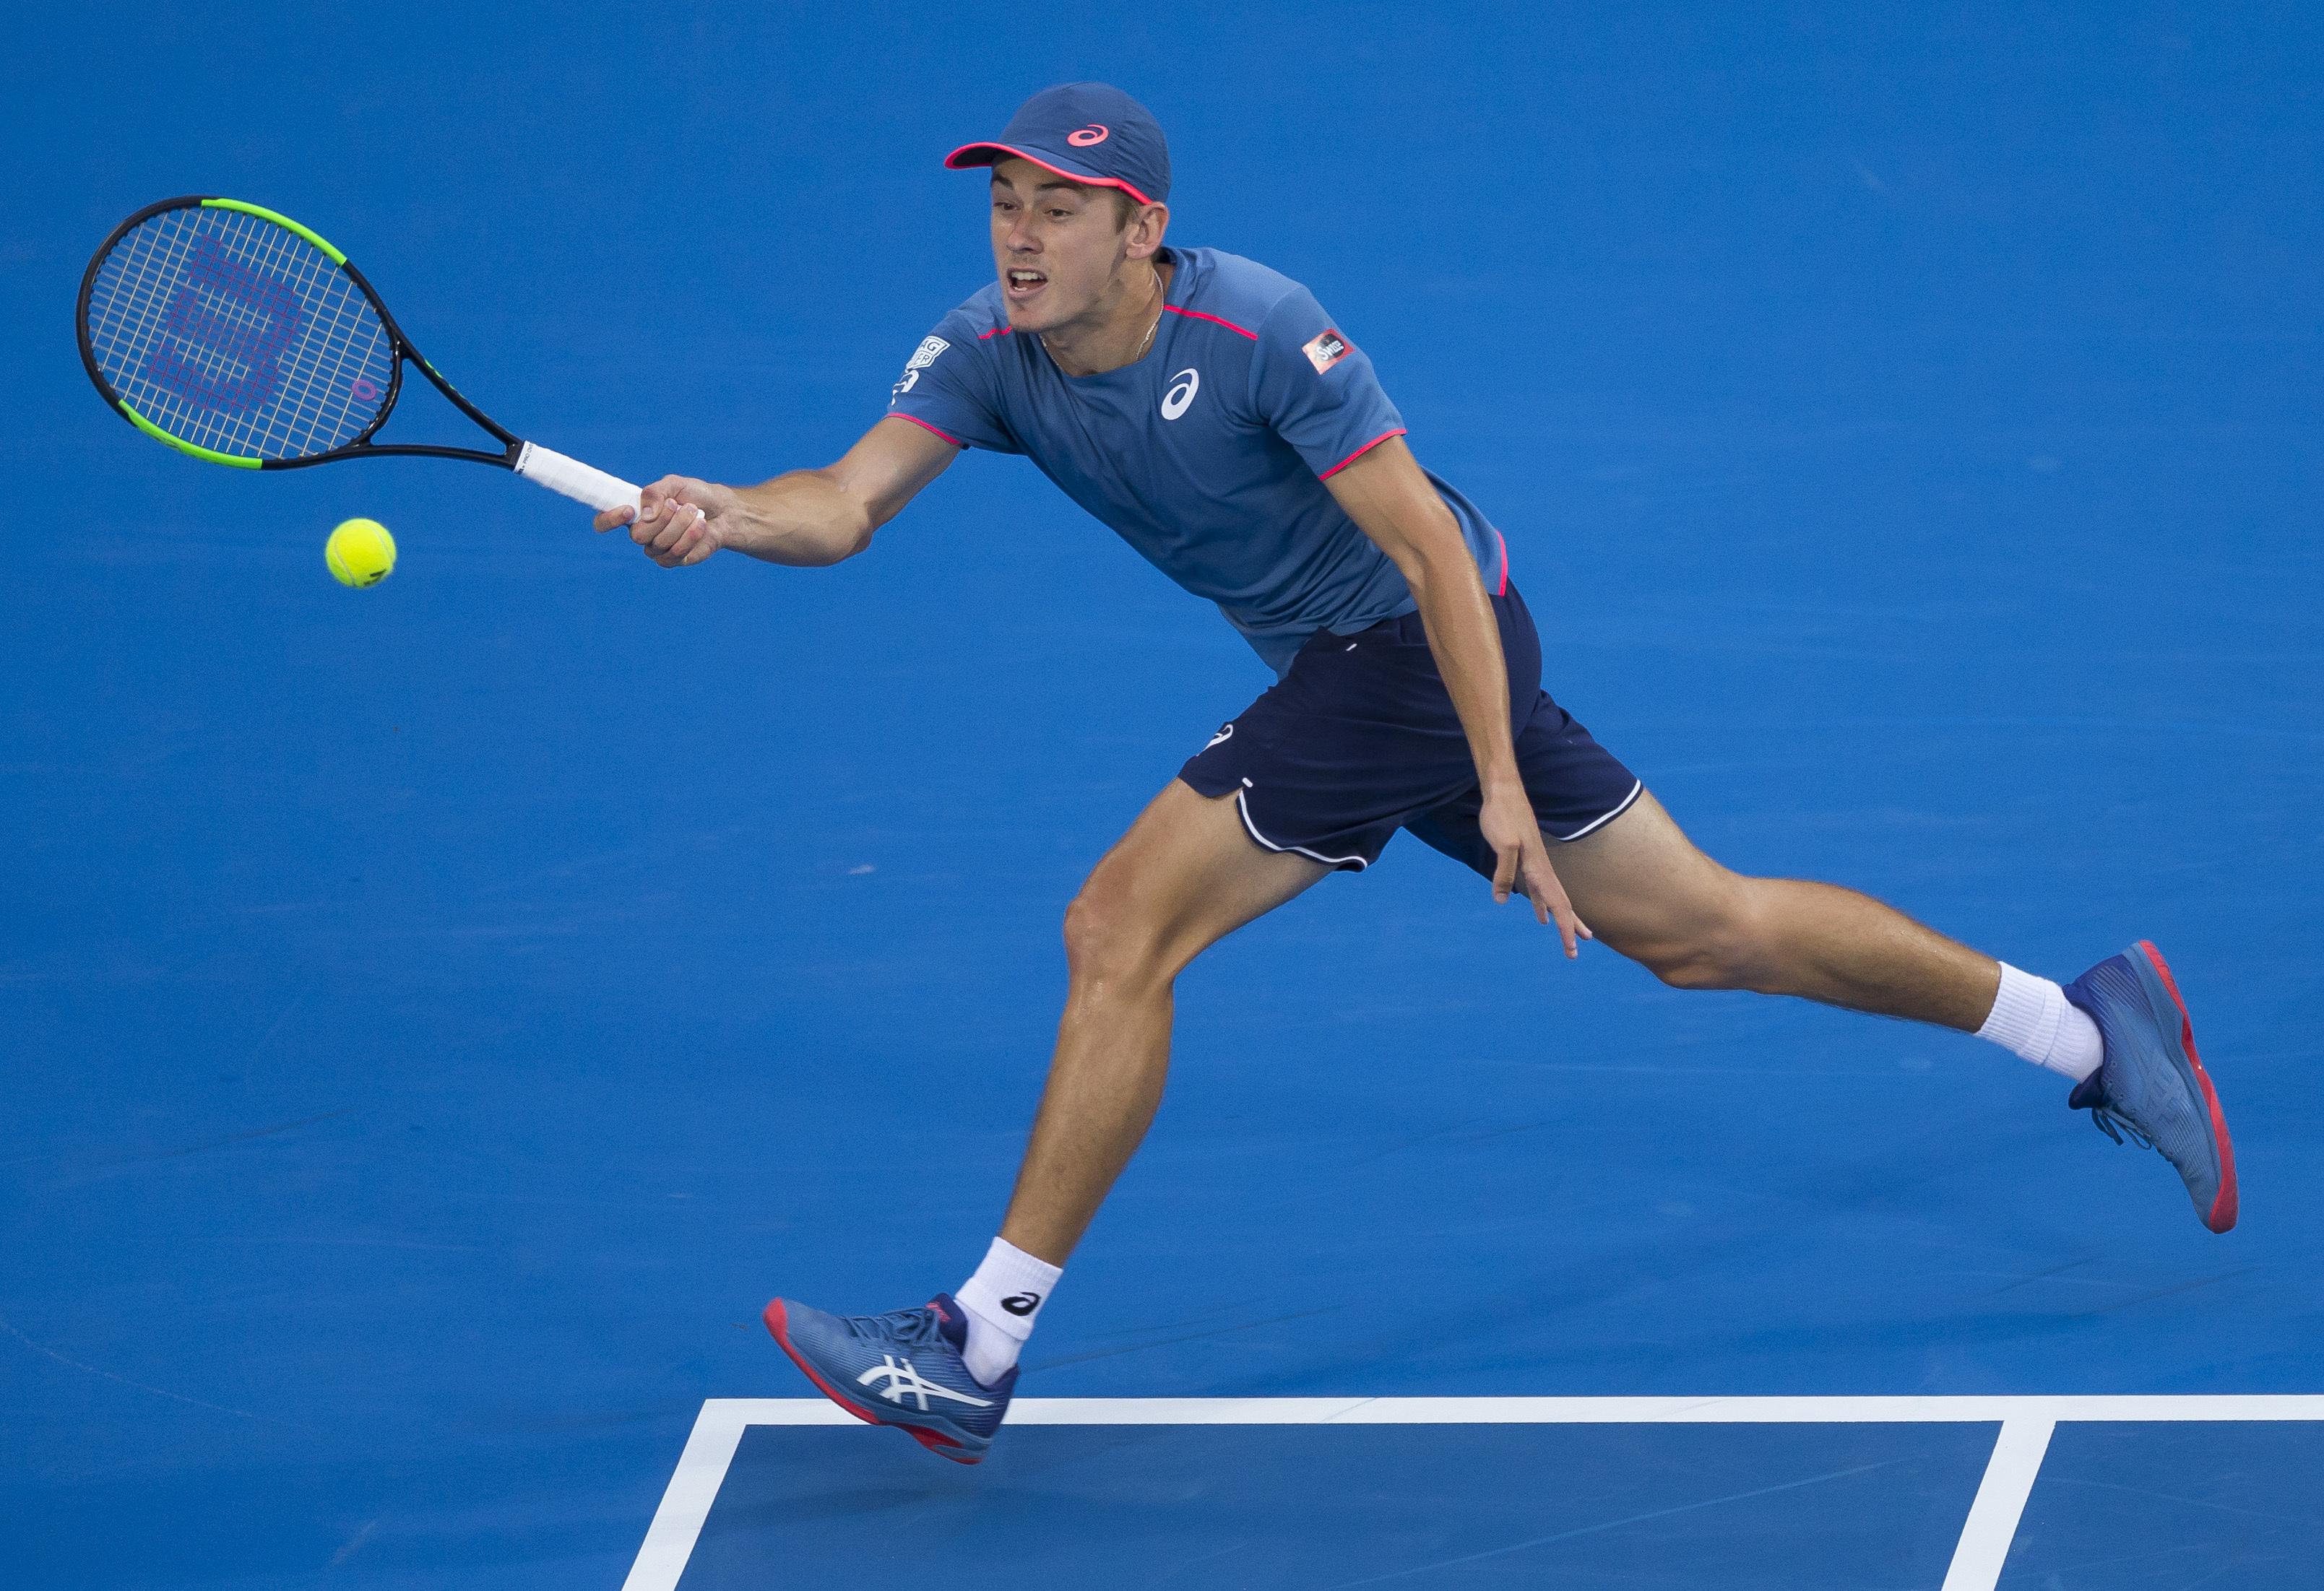 Australian Open 2019 preview